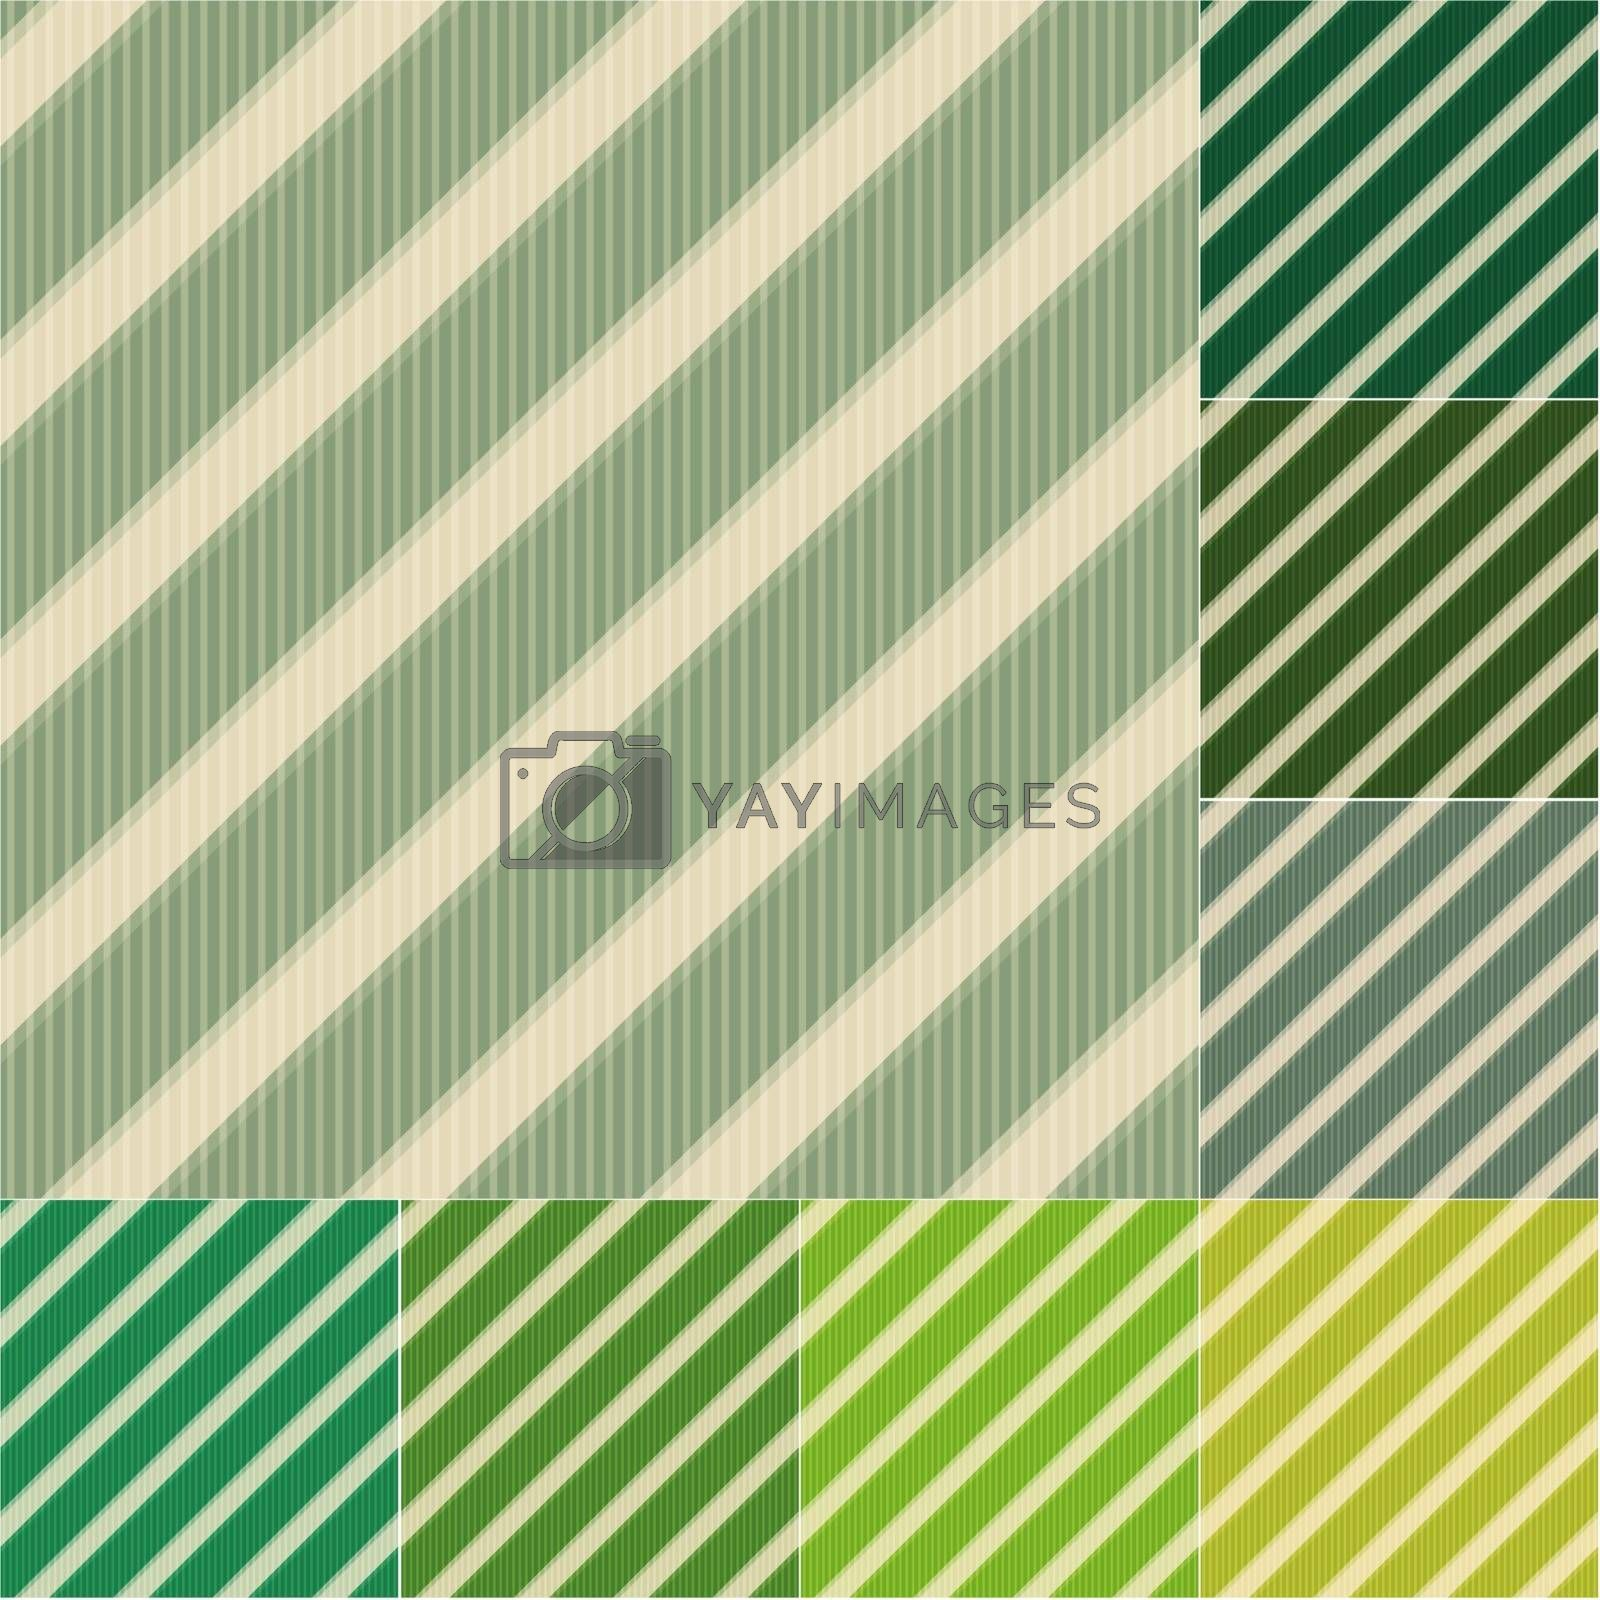 seamless green stripes background set by pauljune